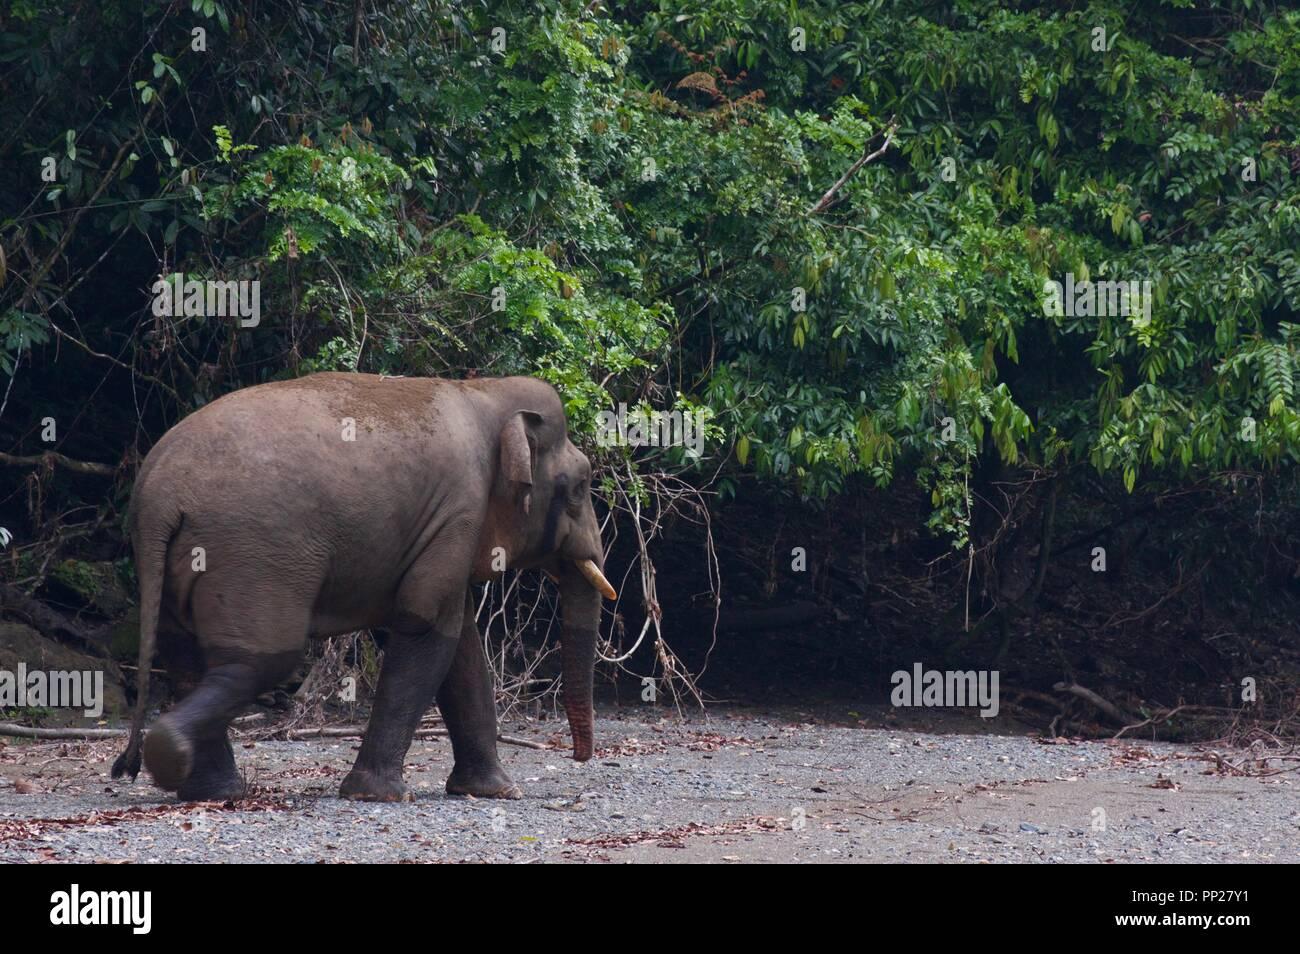 A Borneo Pygmy Elephant (Elephas maximus borneensis) in Danum Valley Conservation Area, Sabah, East Malaysia, Borneo - Stock Image